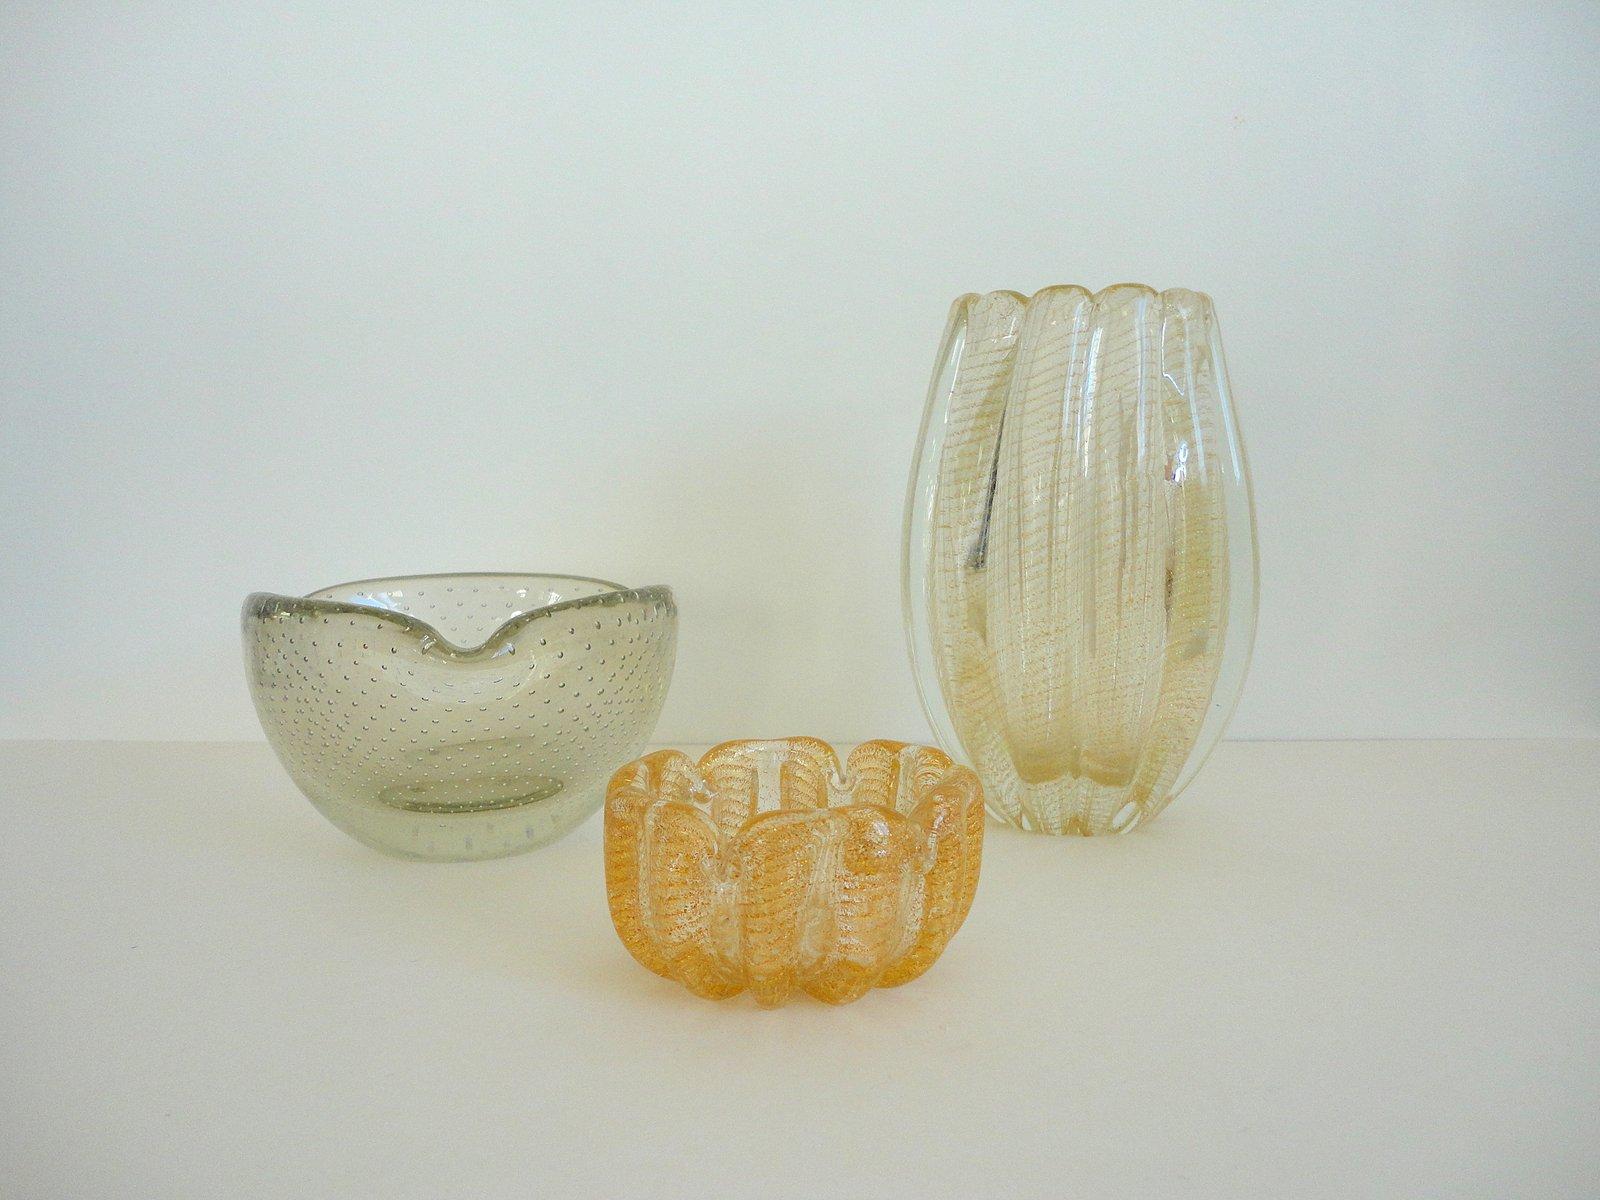 Murano glass vases from seguso barovier toso 1950s for Barovier e toso